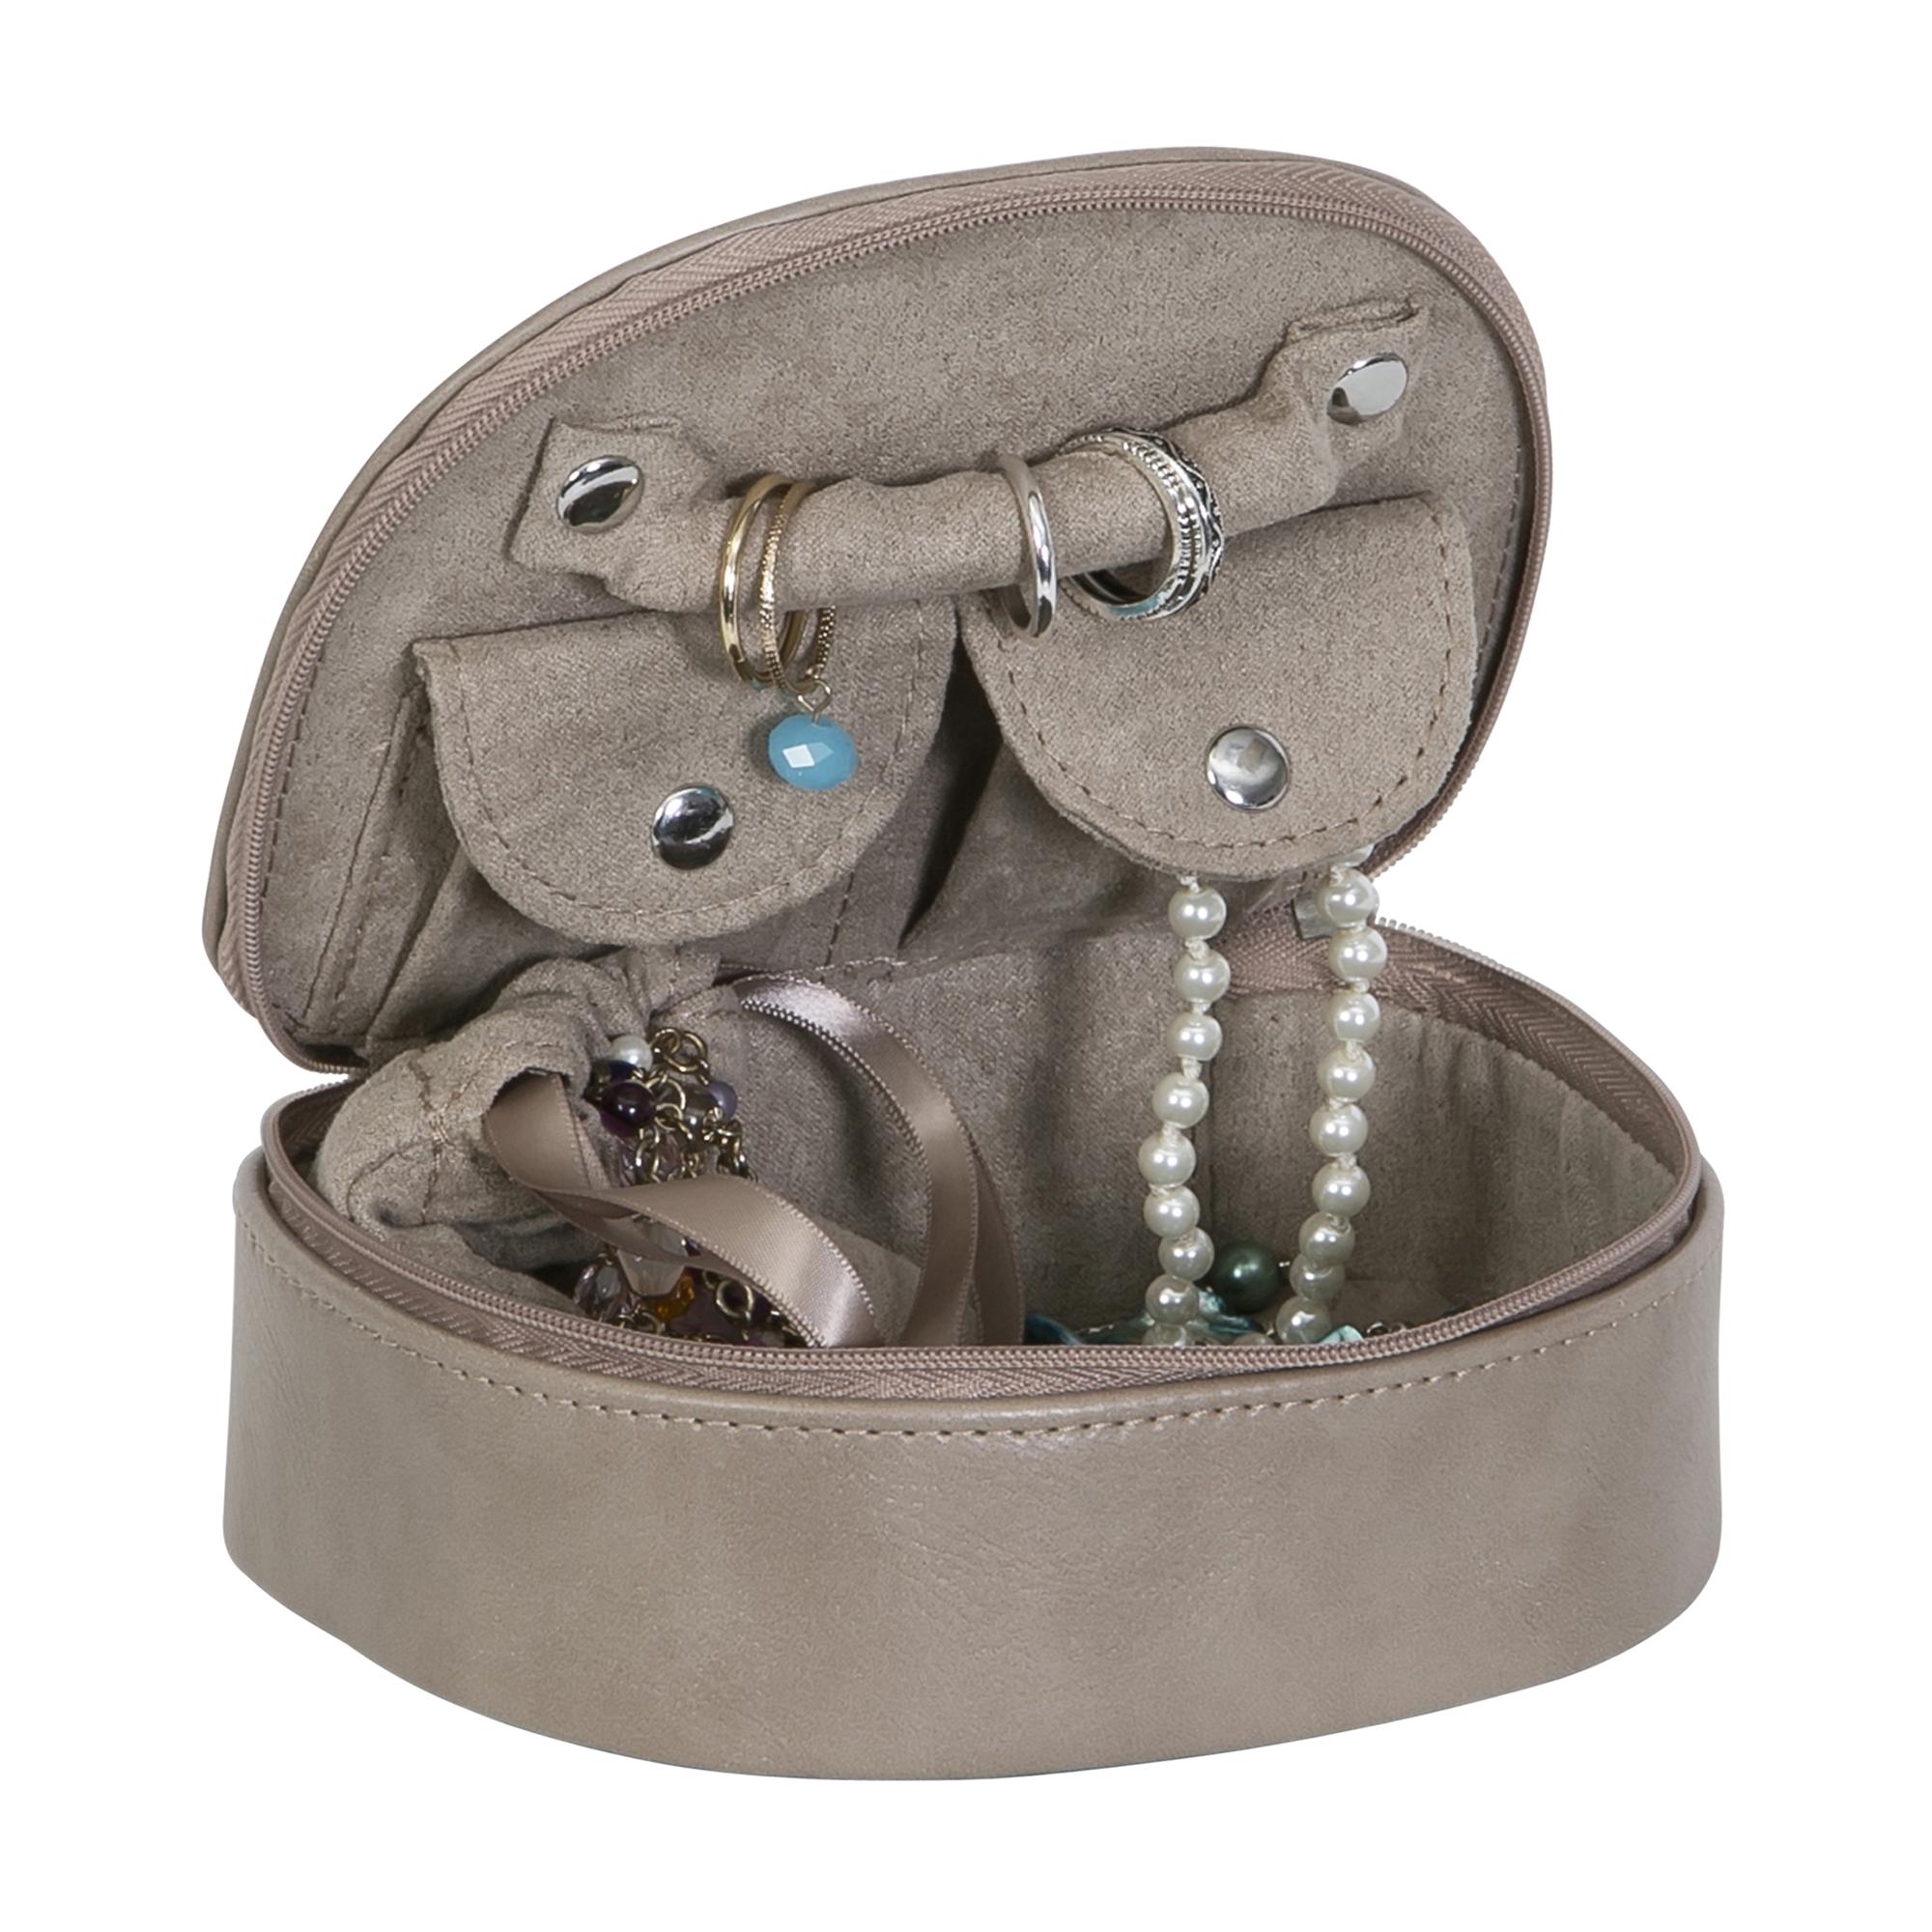 Mele Co Plush Fabric fashion jewelry box Sand